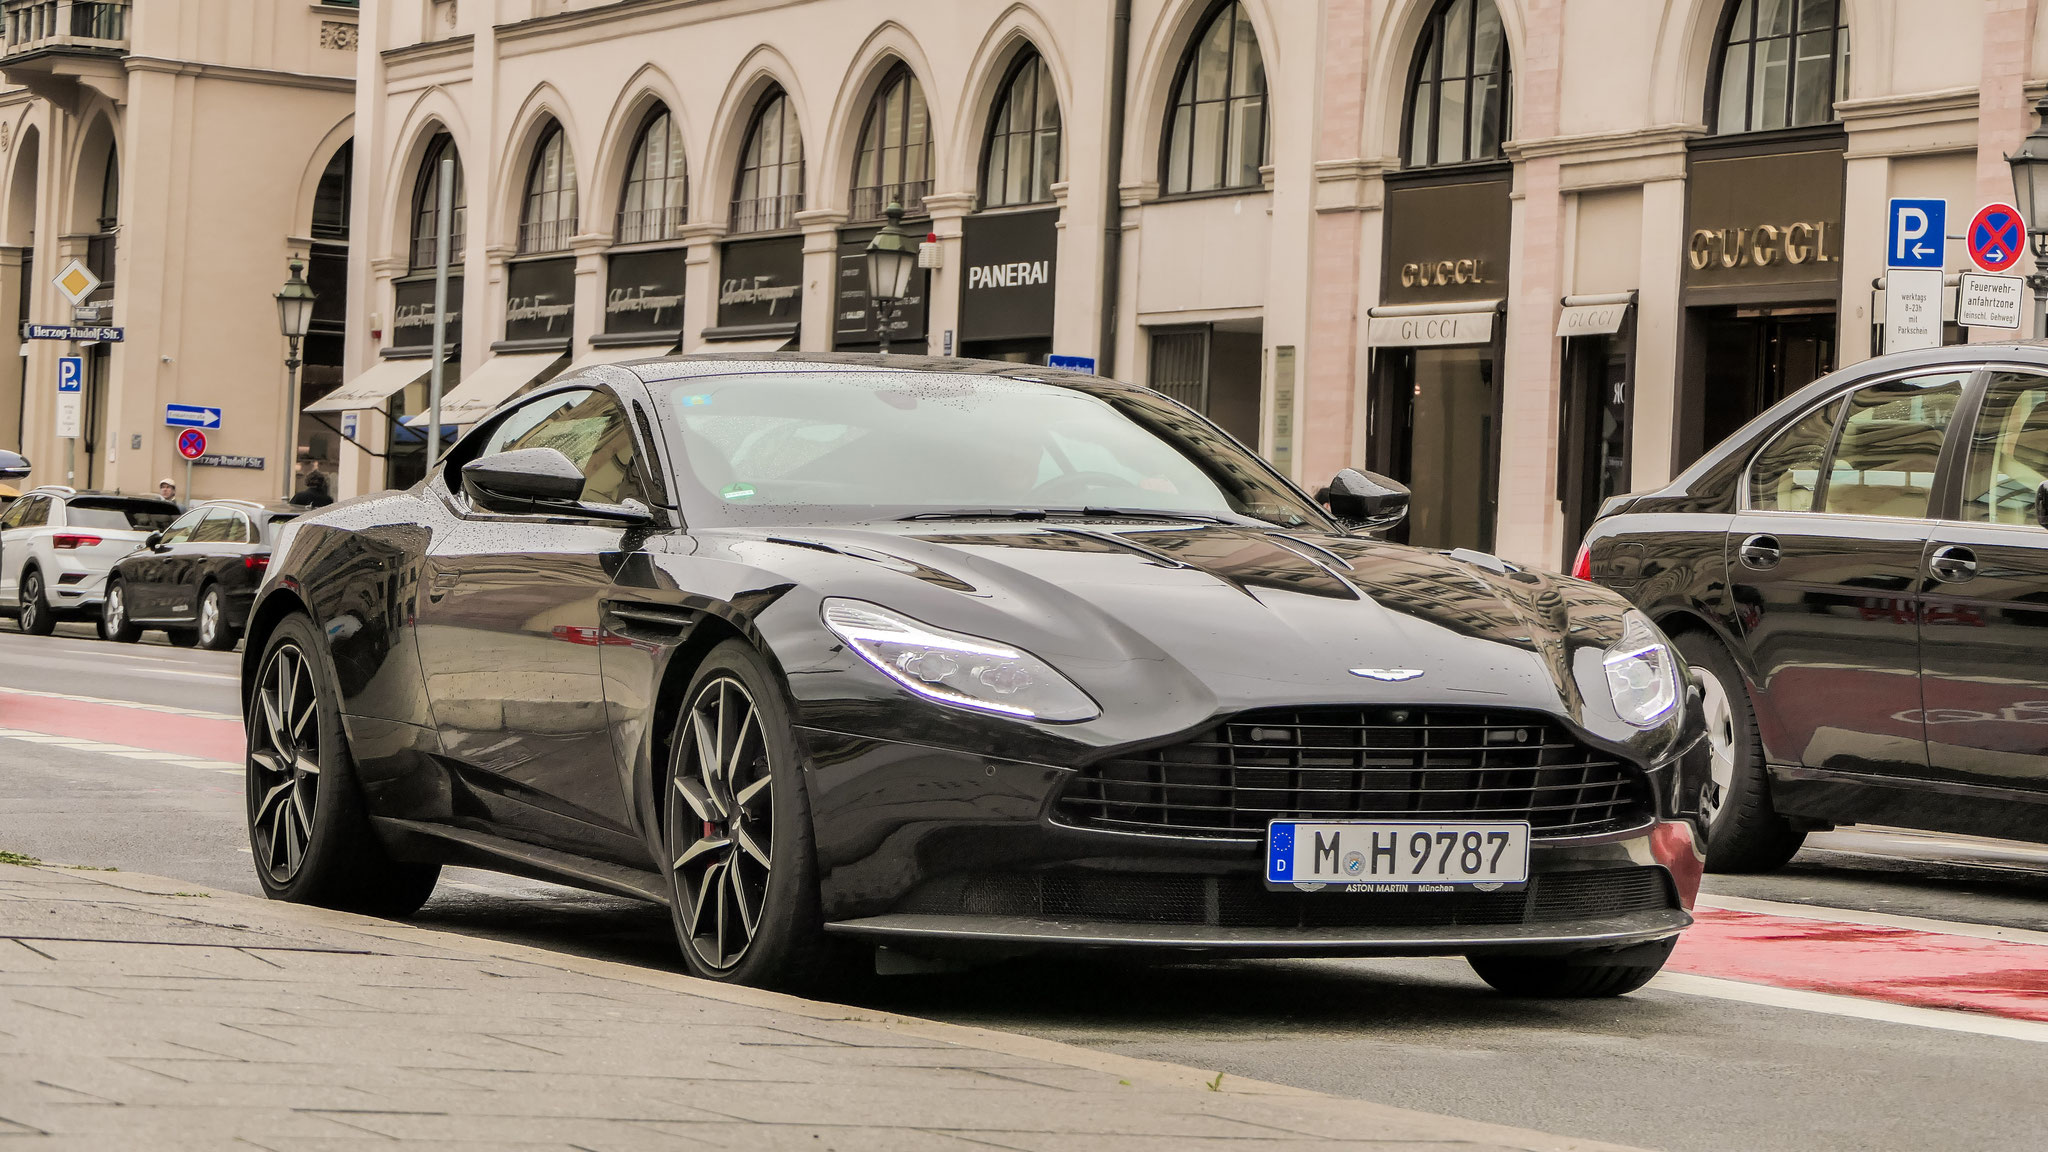 Aston Martin DB11 - M-H-9787